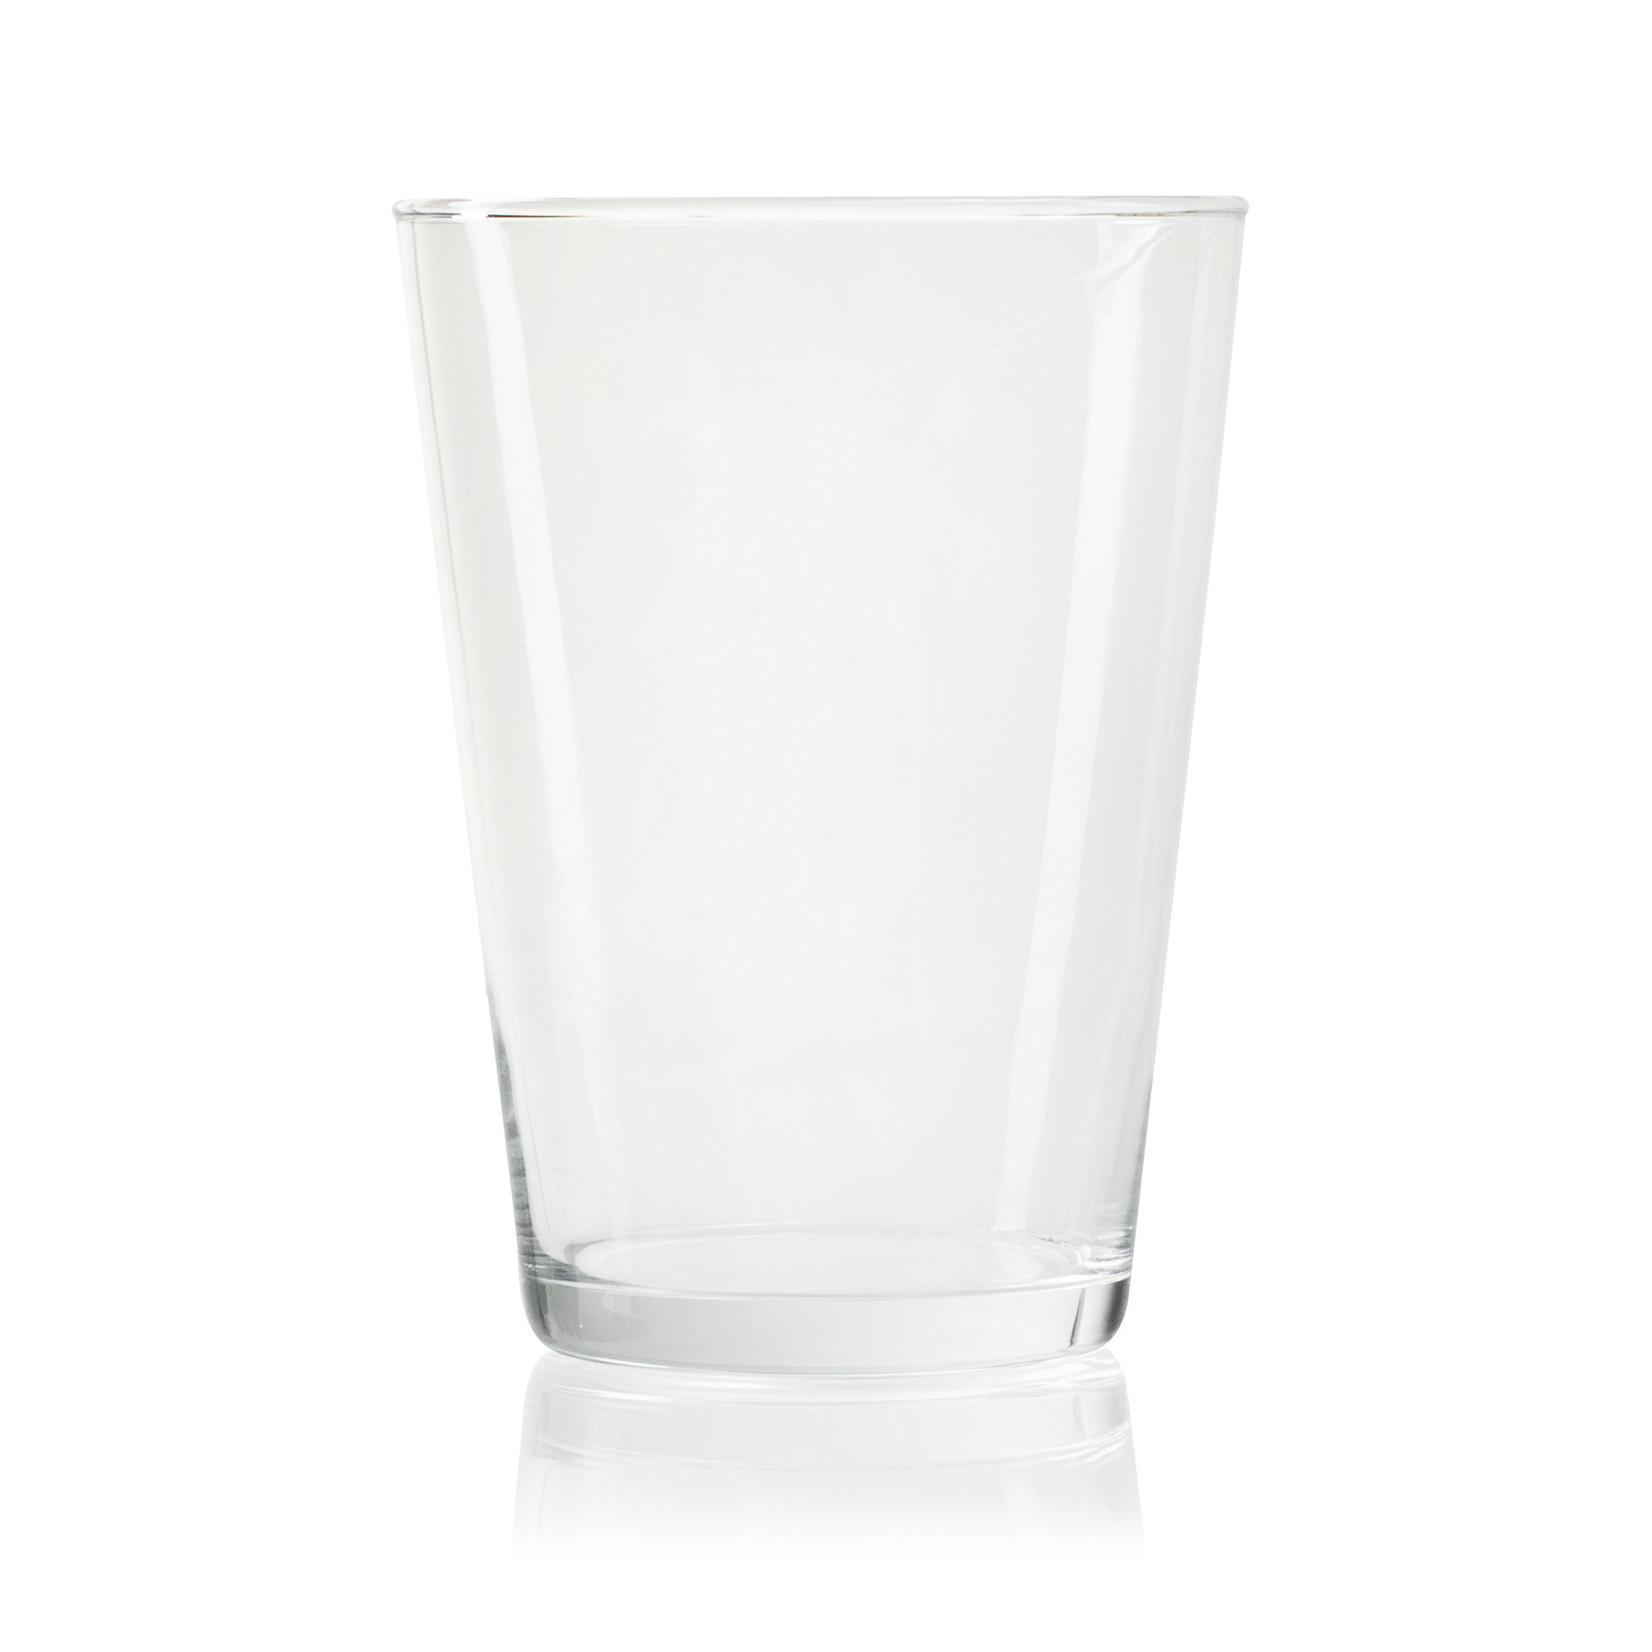 Jodeco Glass Boeket vaas 'Beau'